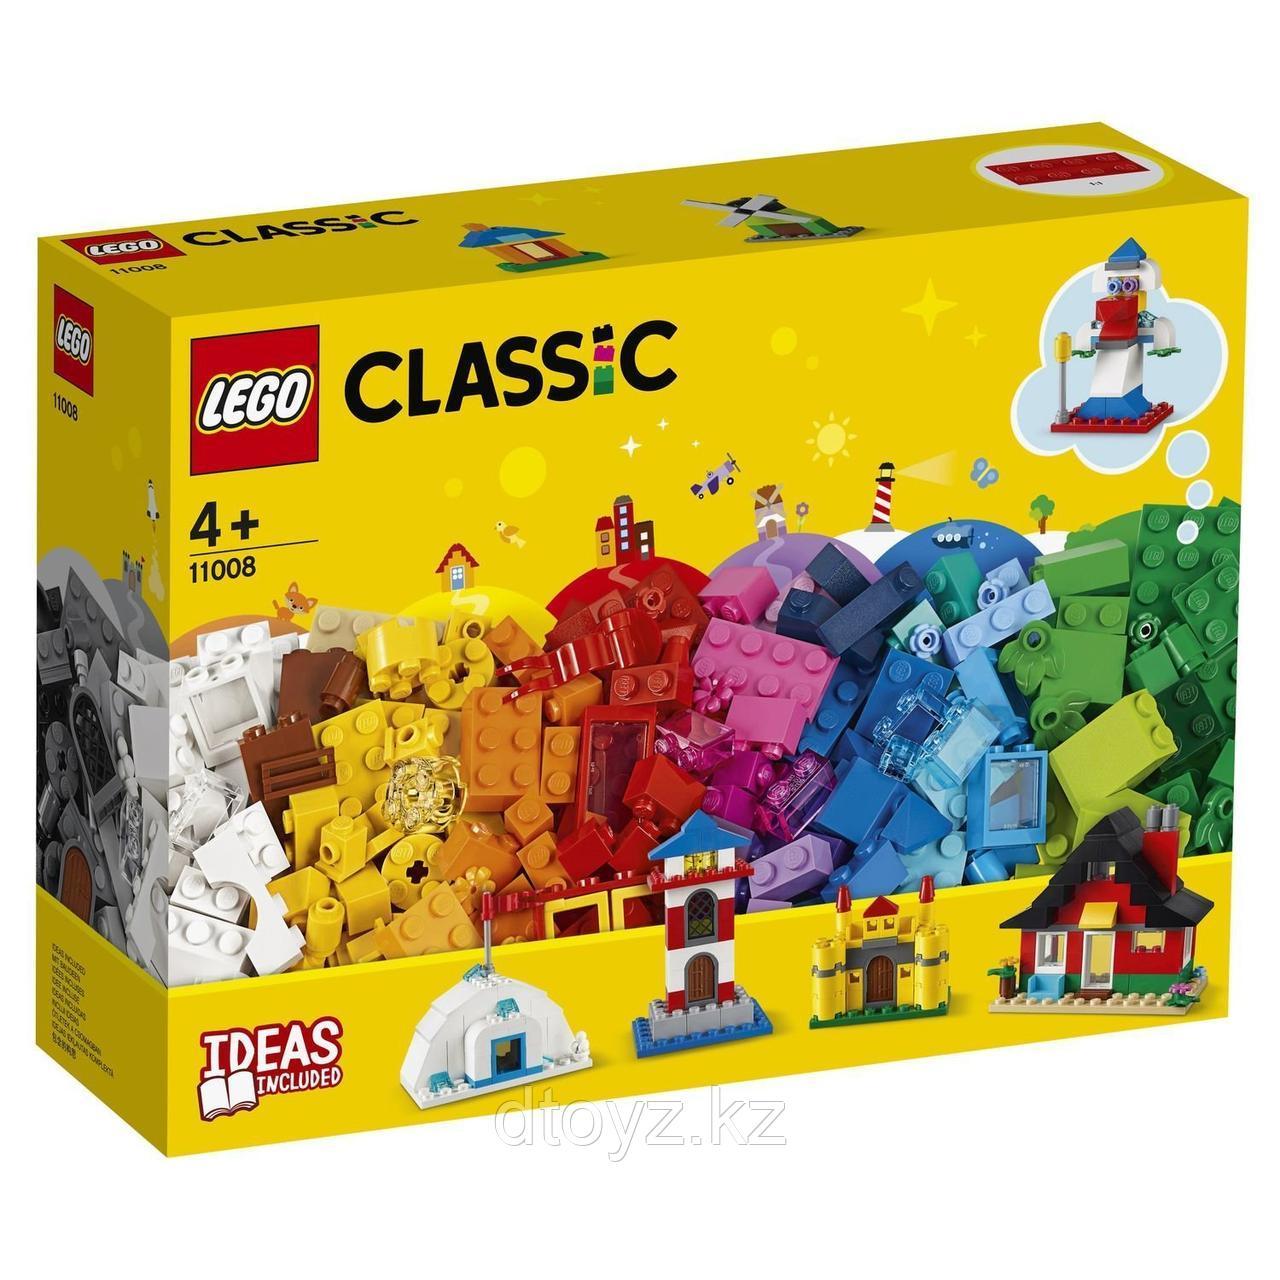 Lego Classic 11008 Кубики и домики